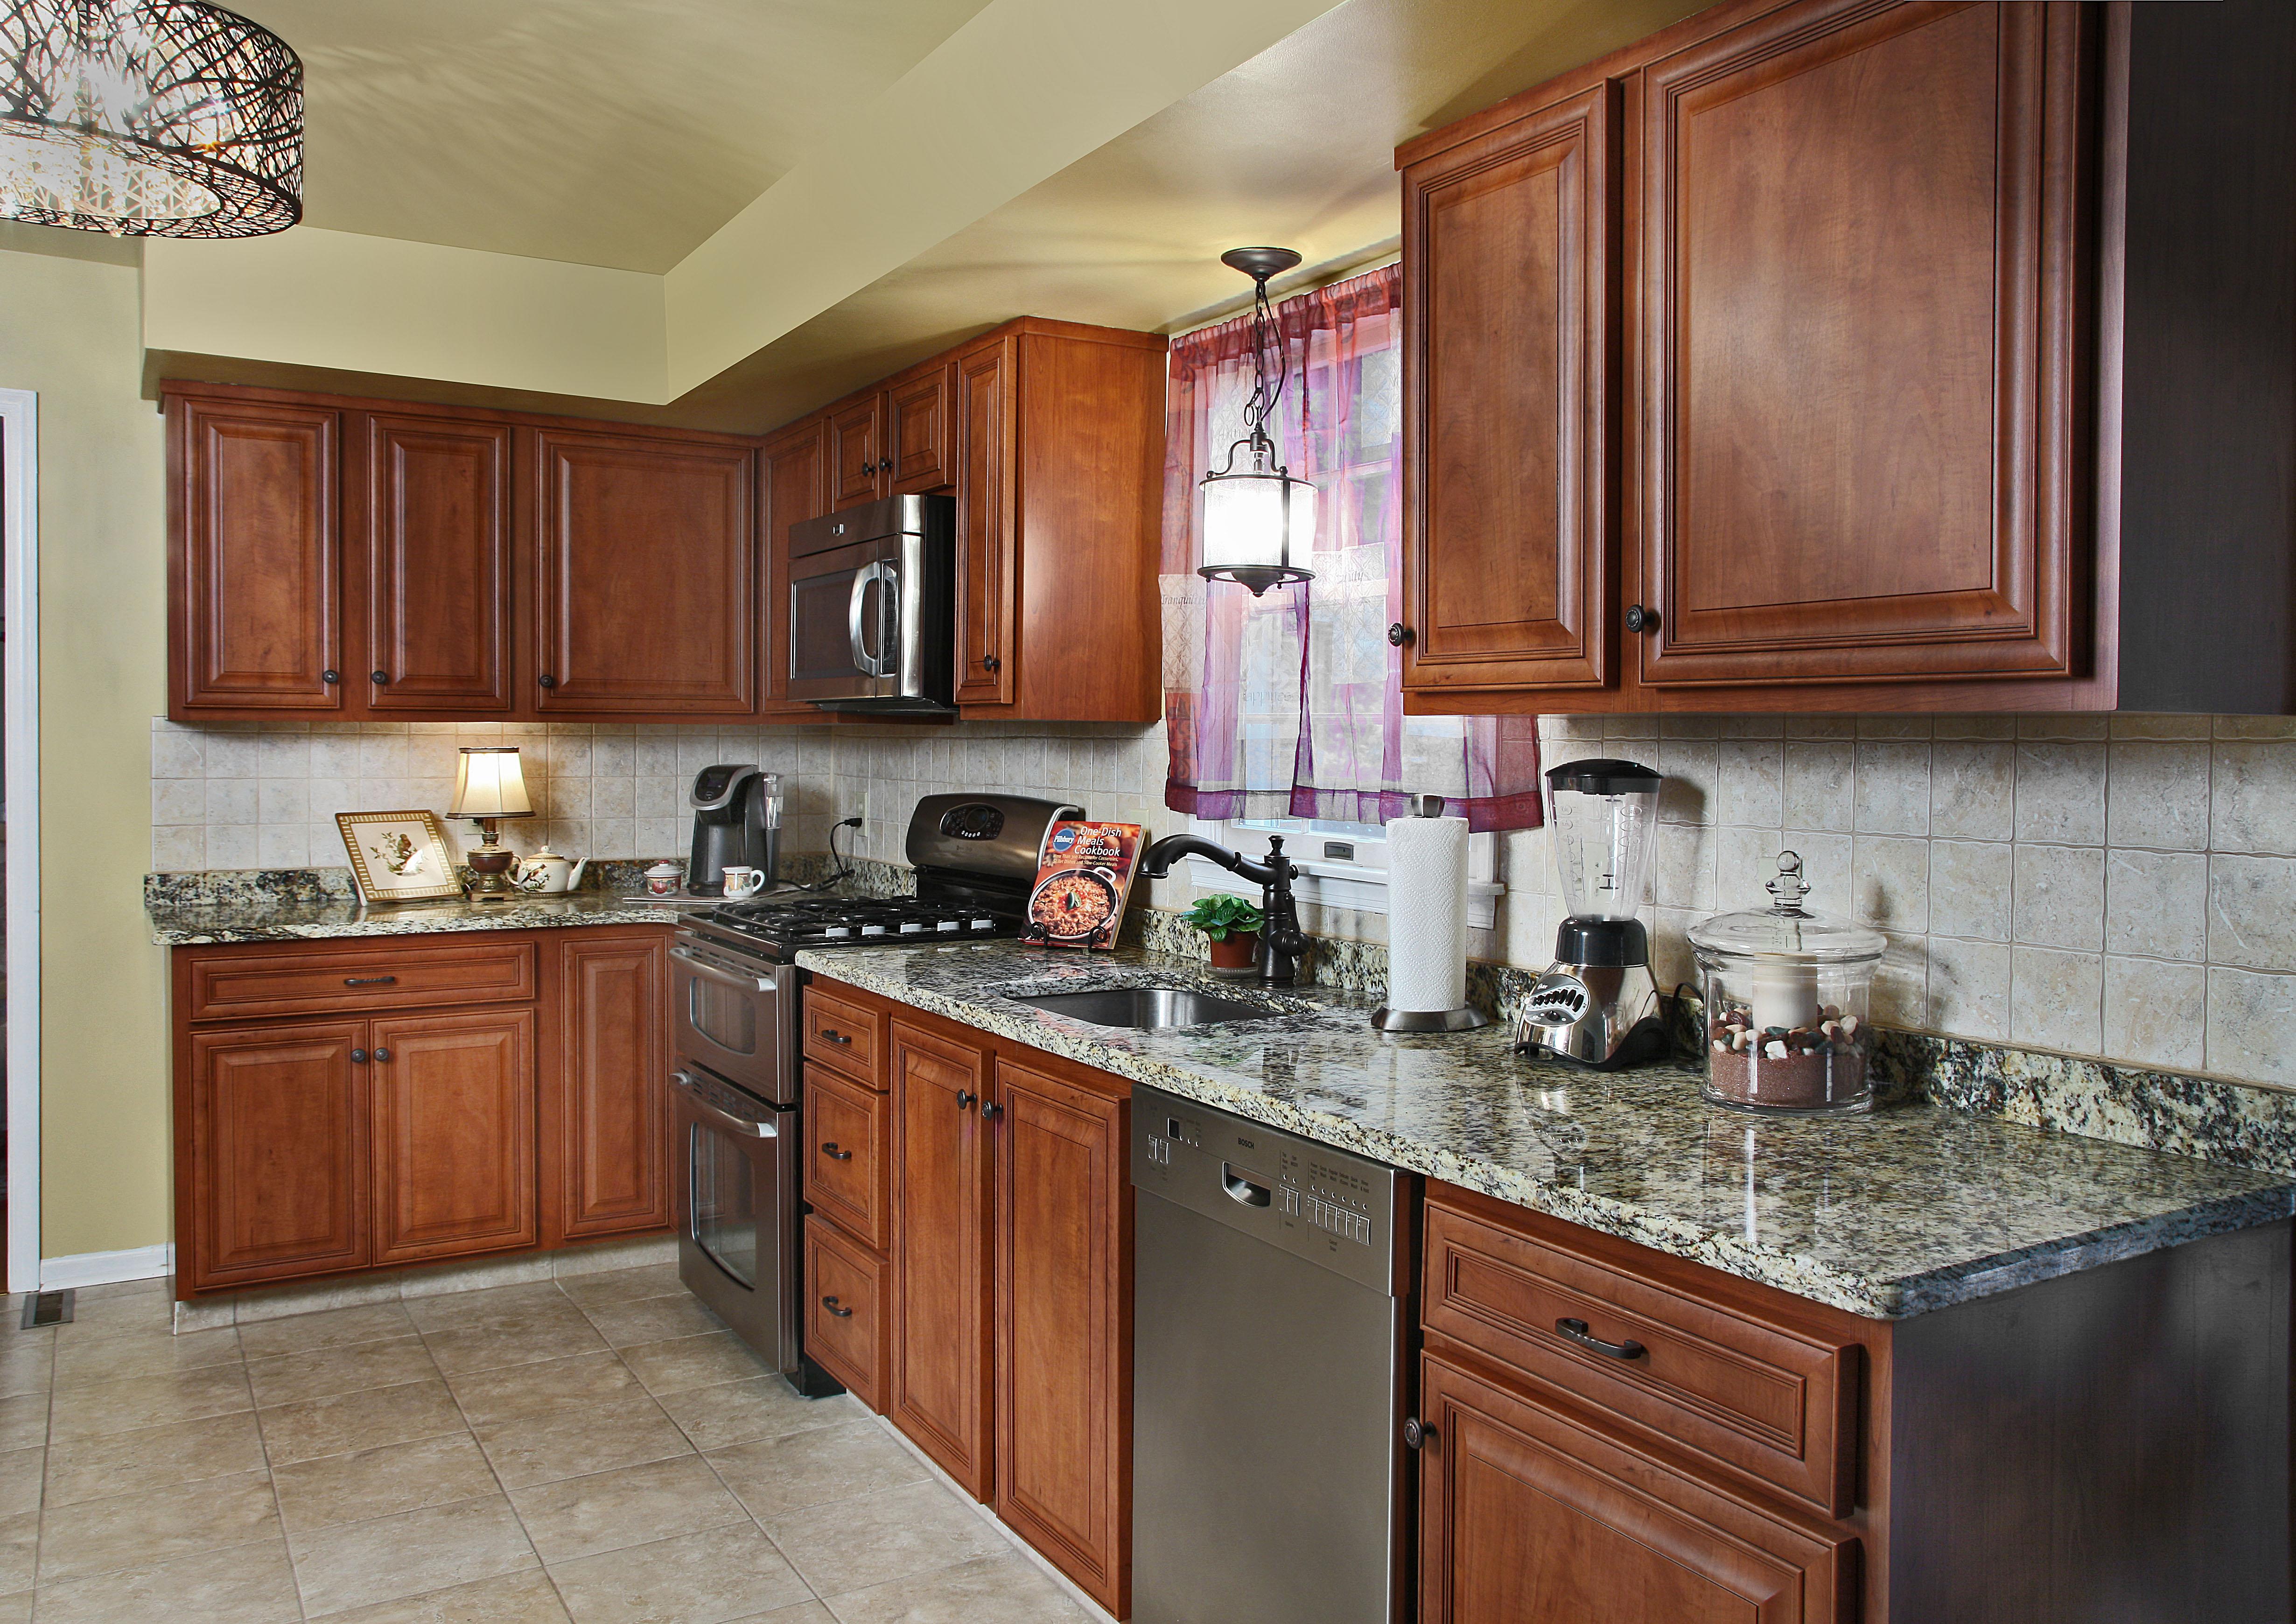 Classic Cherry and Granite countertops Kitchen Magic House